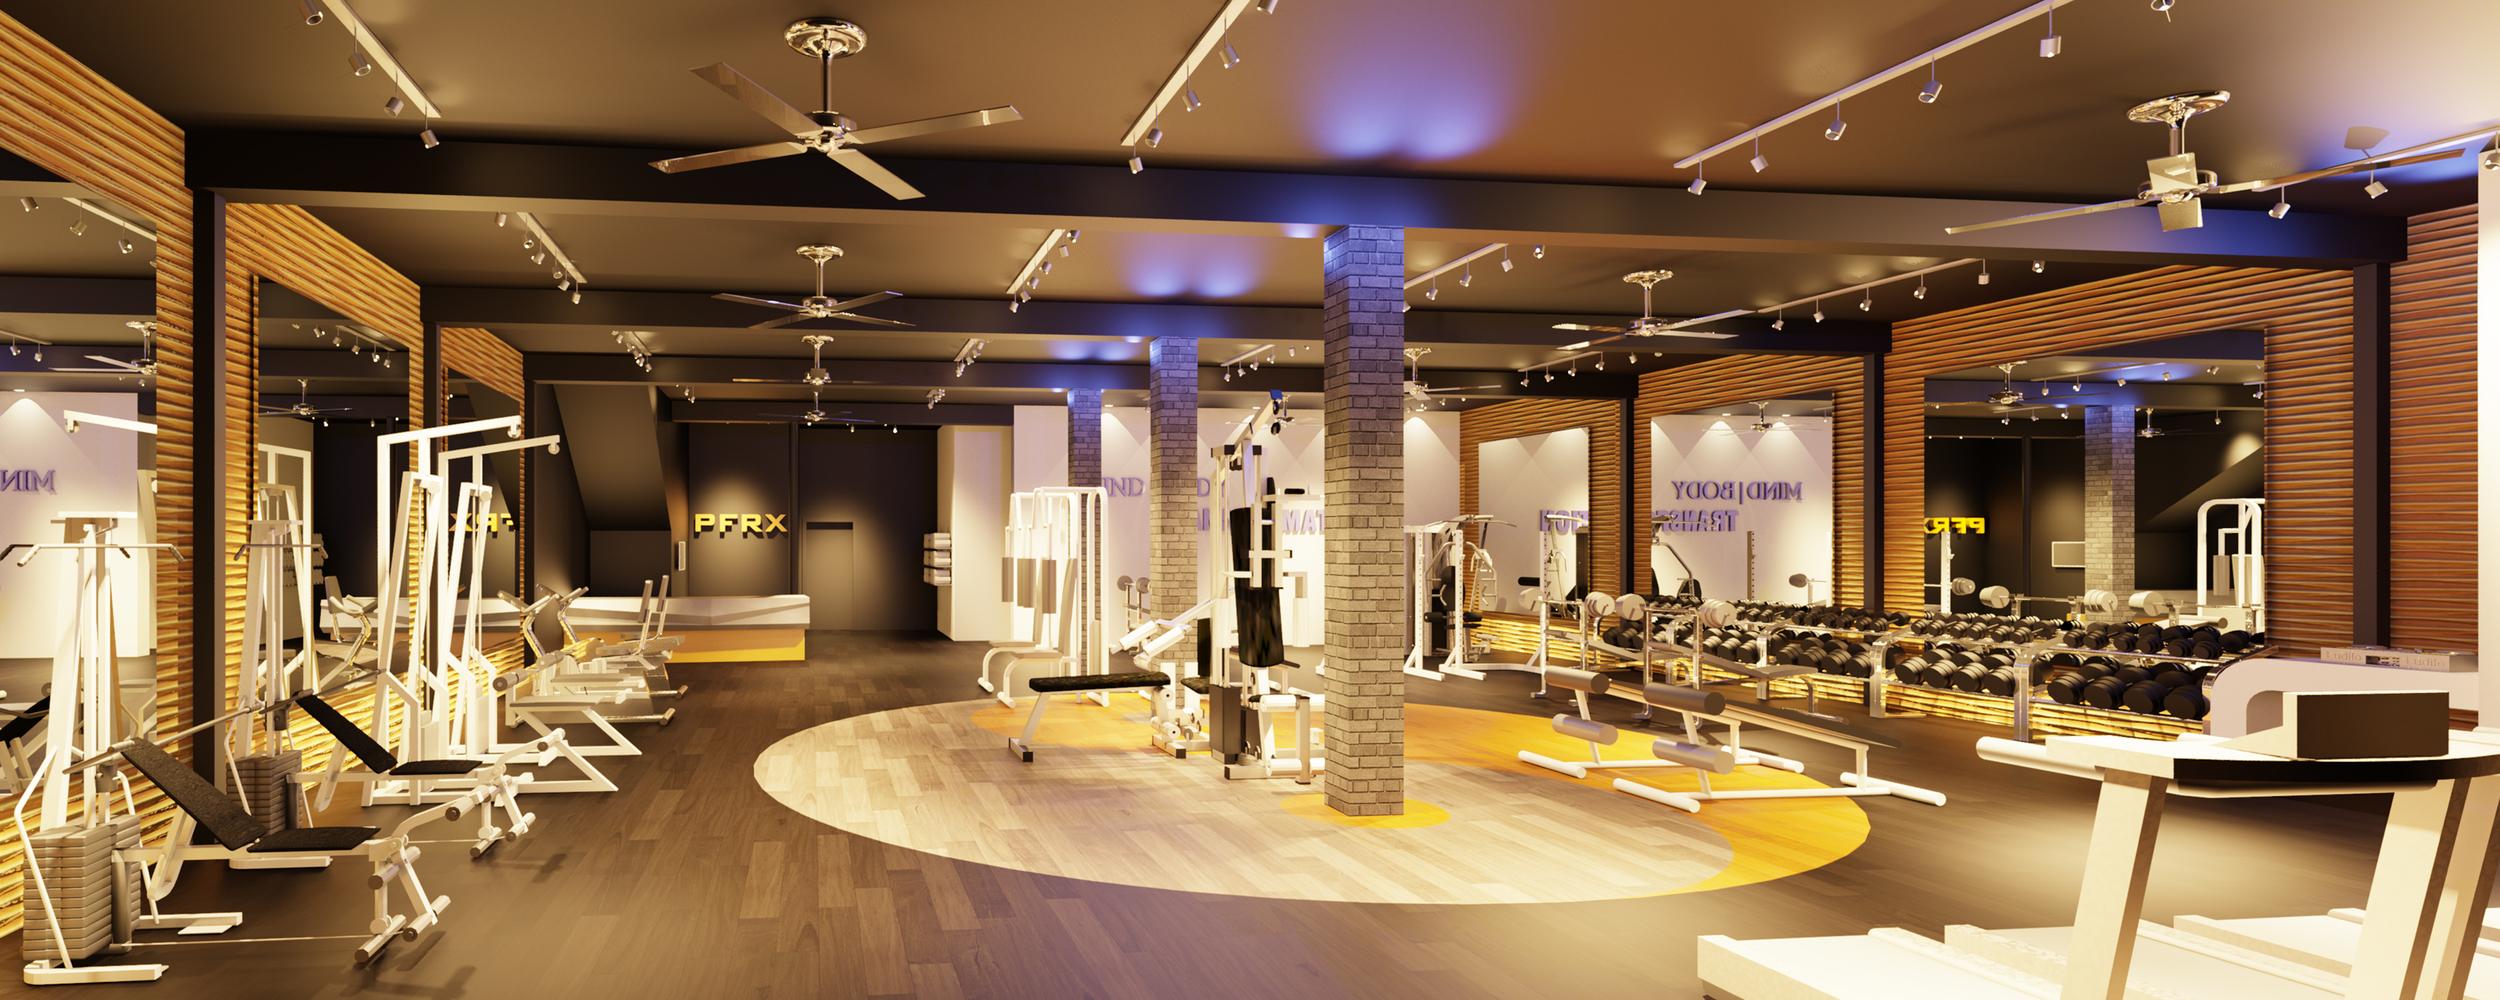 PrimeFitness RX Gym , Julia Street, NOLA